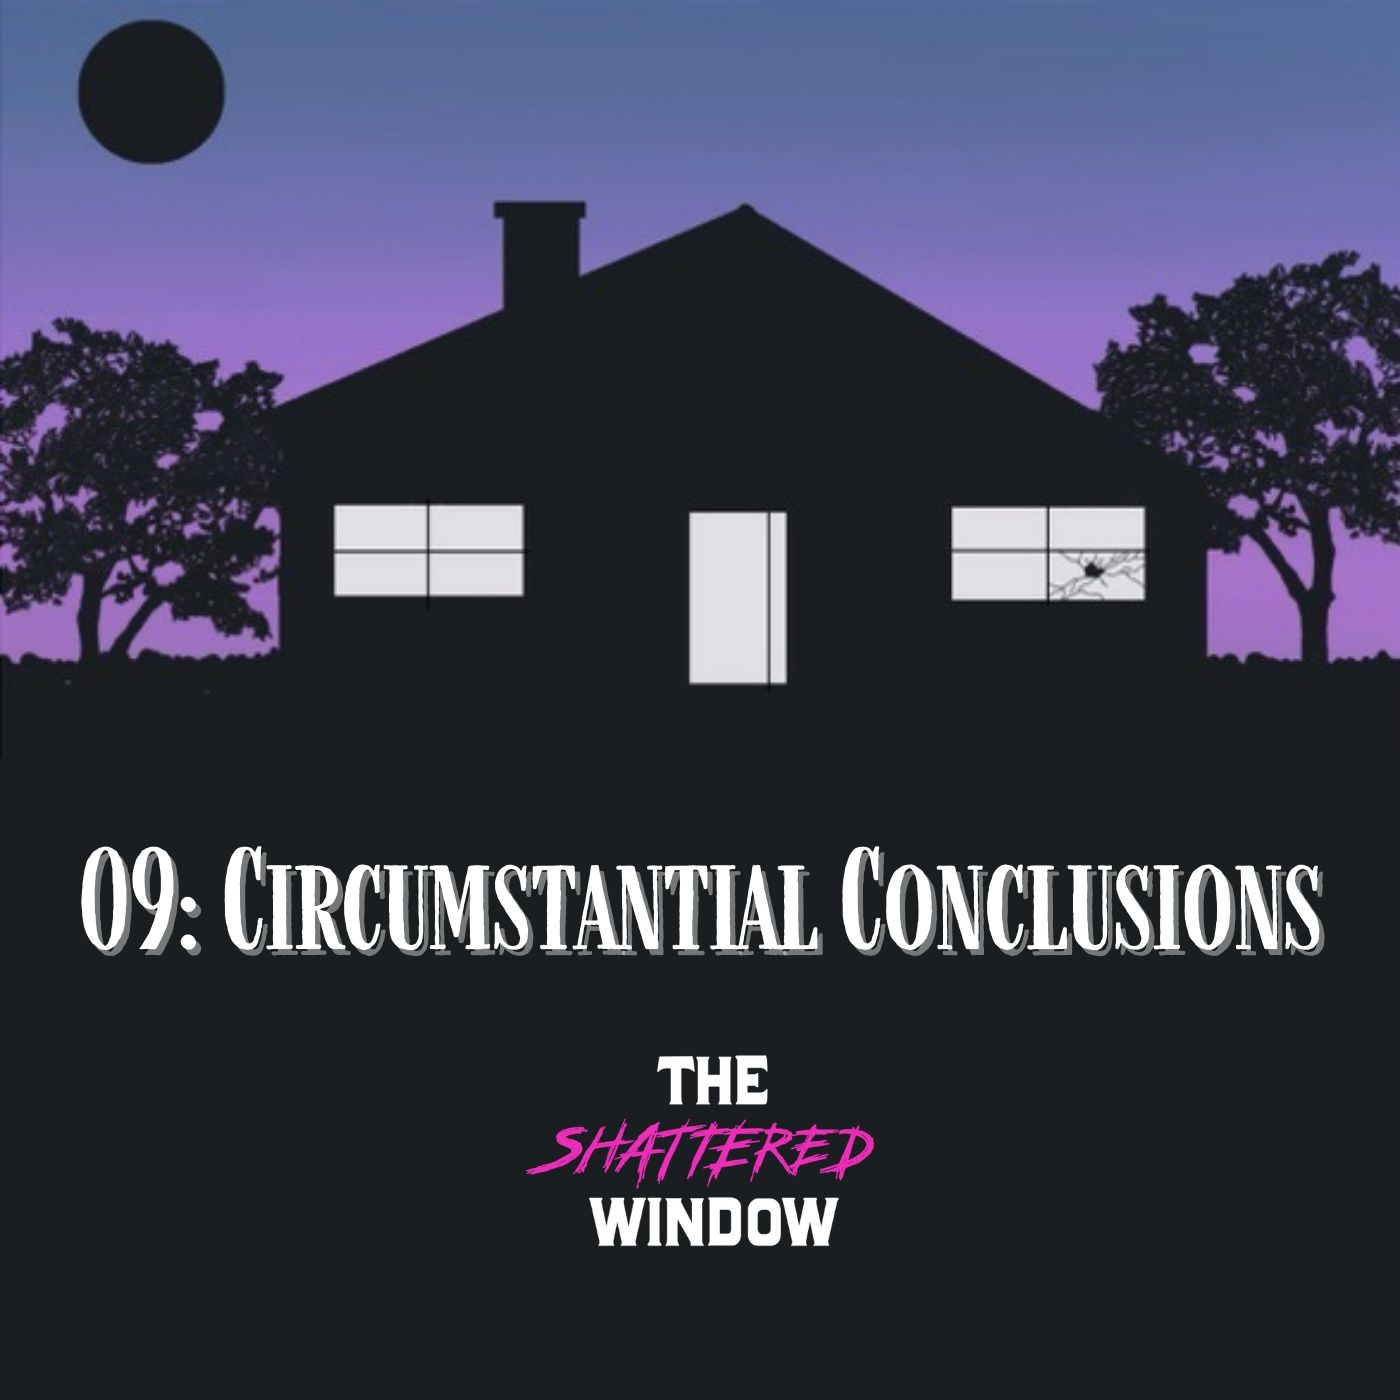 09: Circumstantial Conclusions